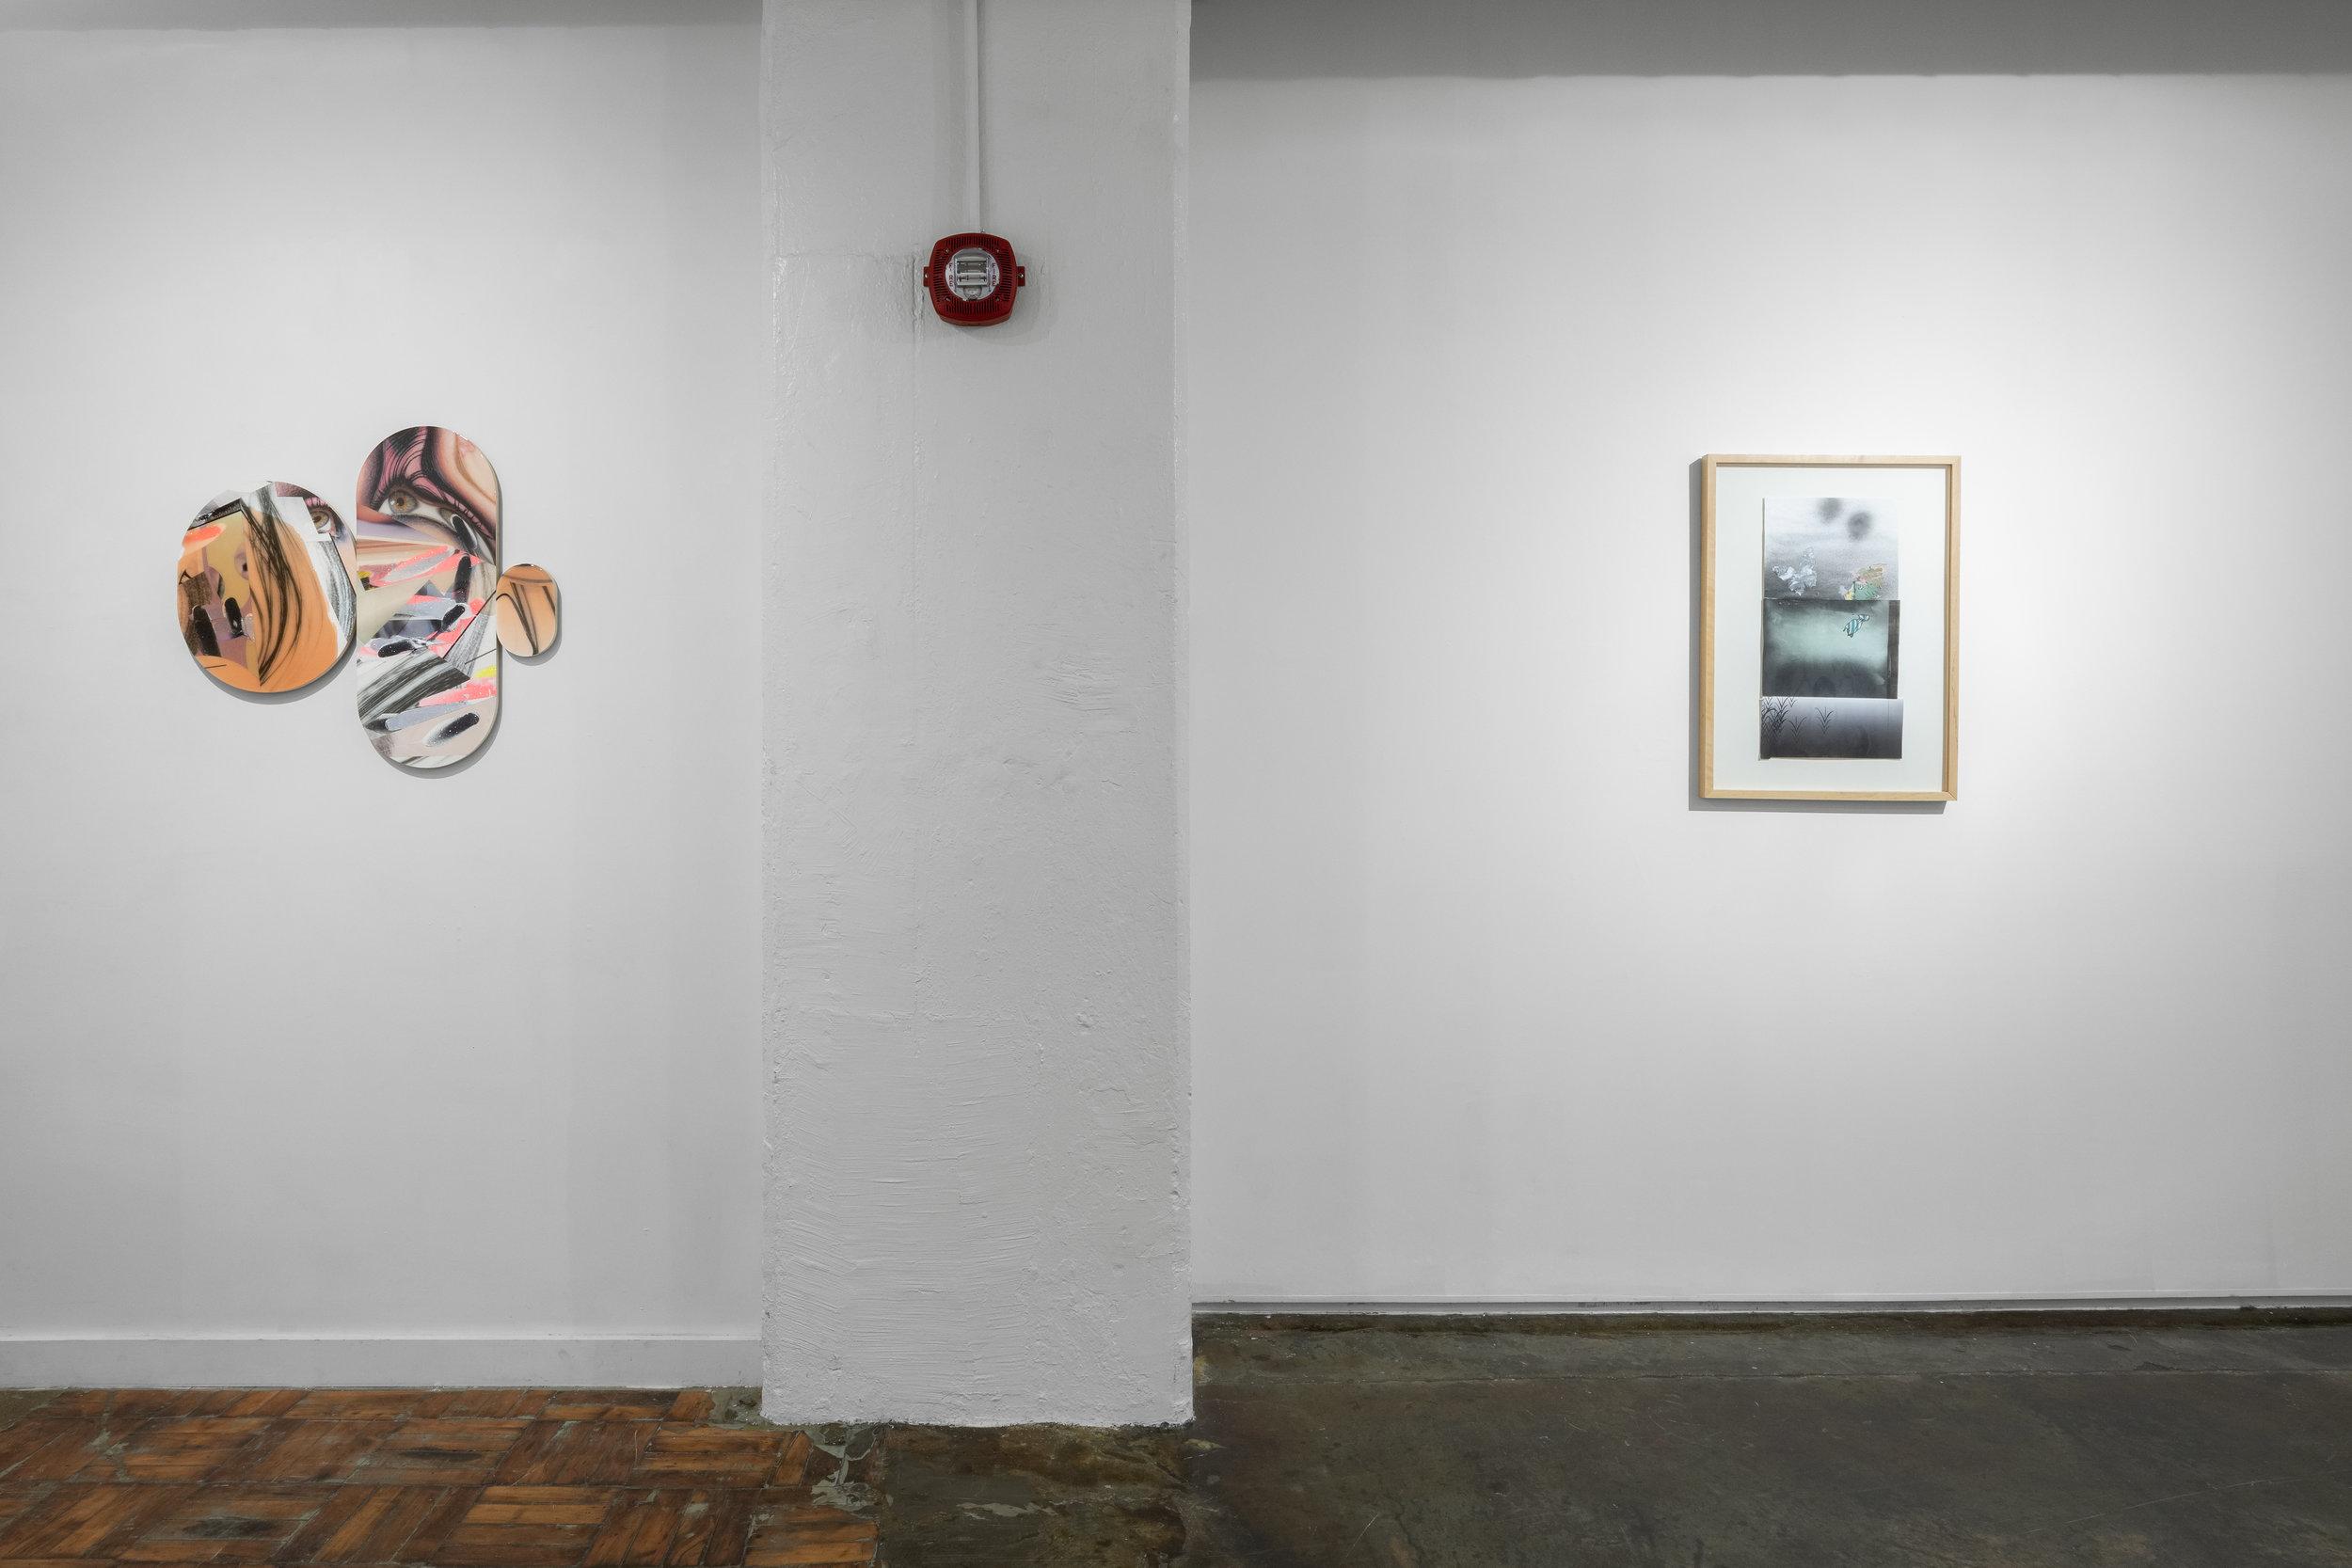 Left: Alisa Henriquez,  Makeover Culture Disfigured No. 2 , 2016. Digital prints, mixed media on wood panel  Right: d'Ann de Simone,  Black Butterfly . Mixed media collage